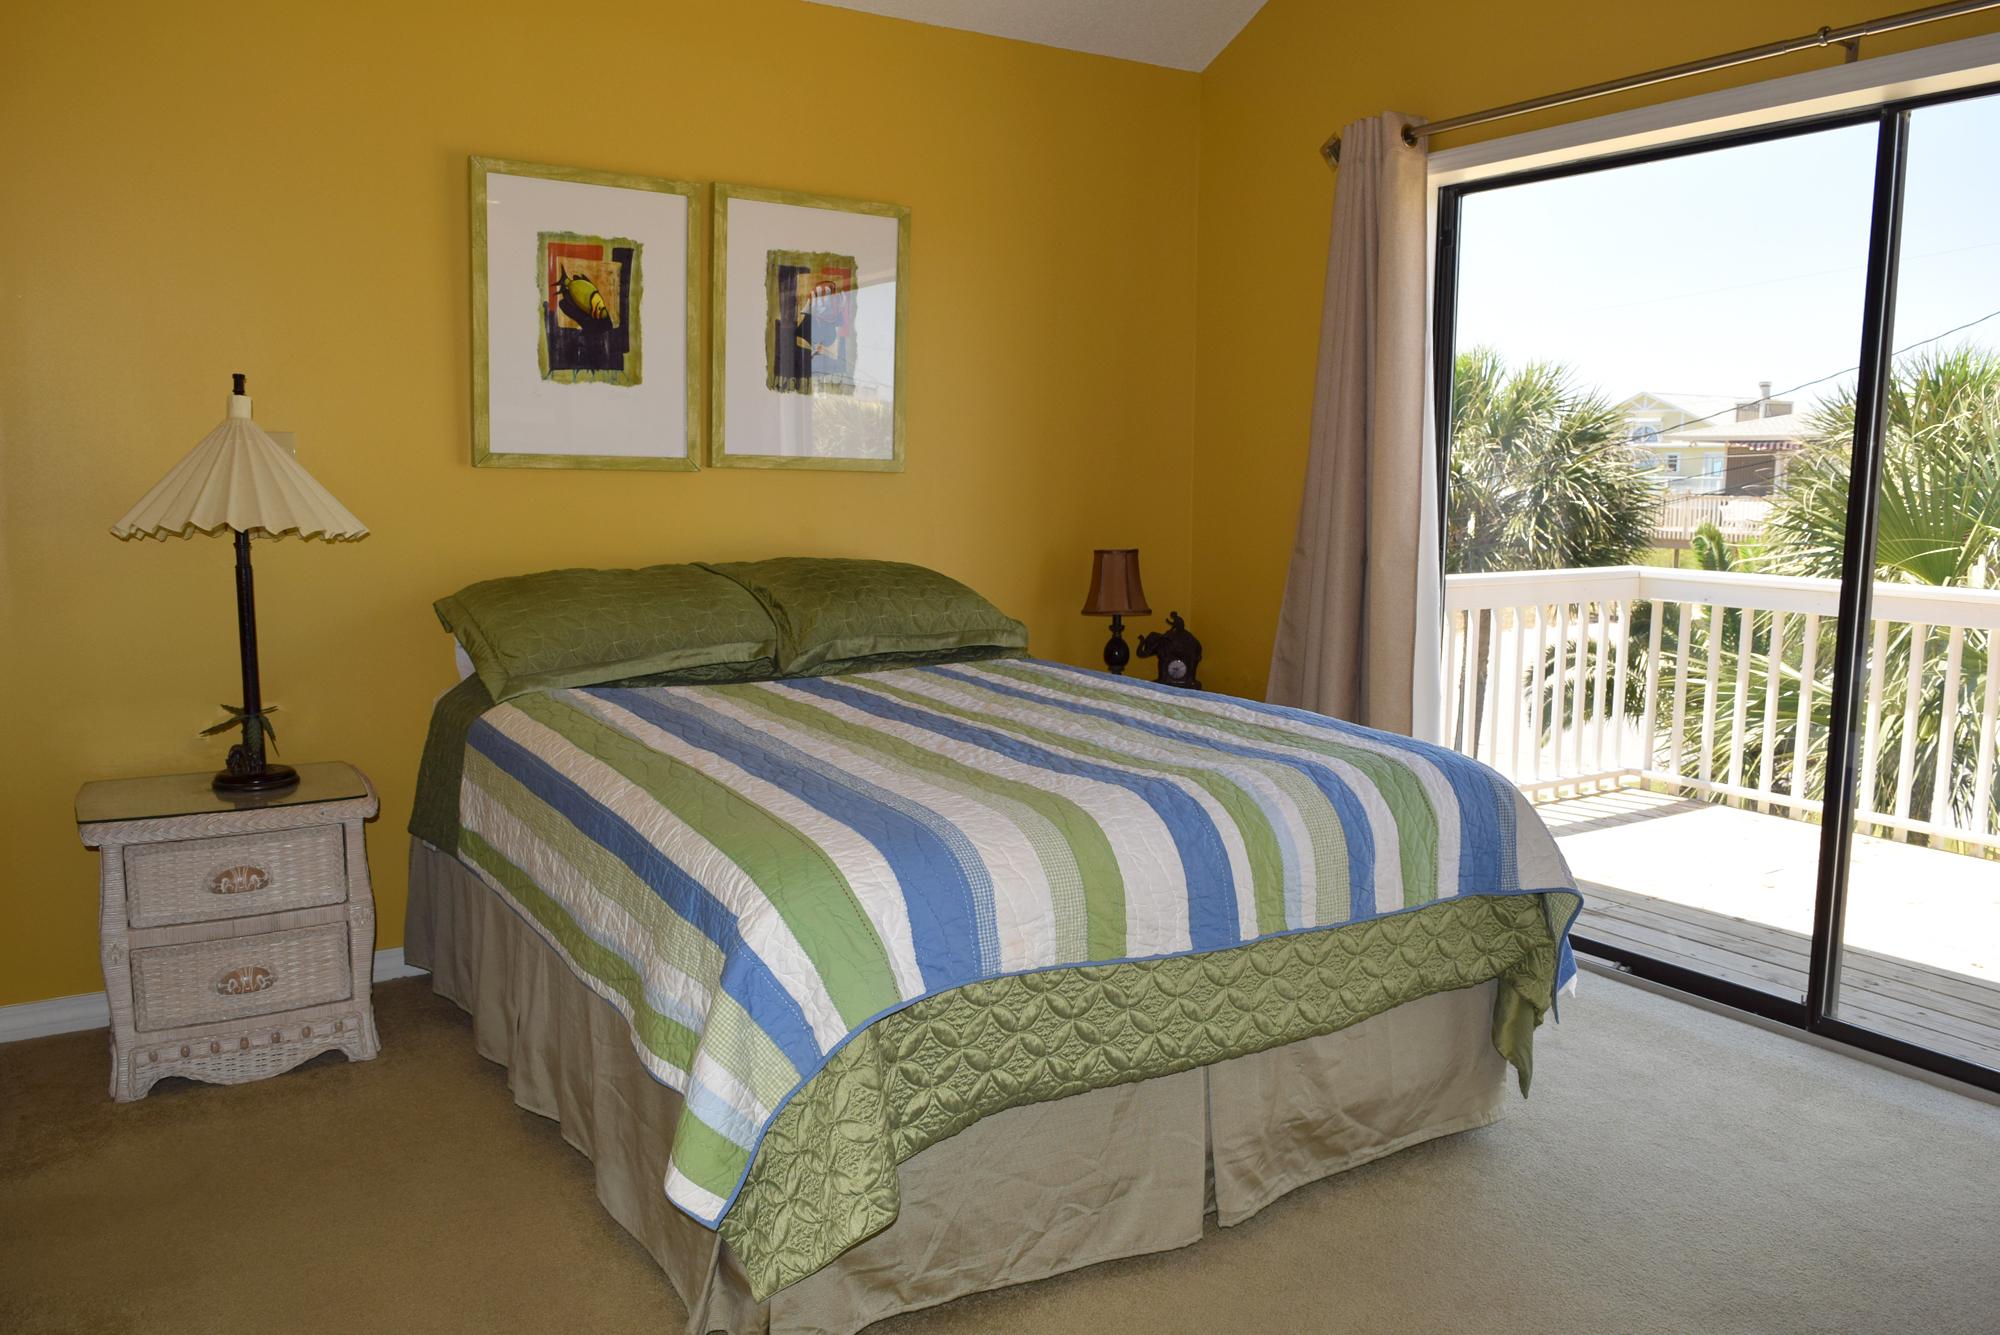 Maldonado 1010 House/Cottage rental in Pensacola Beach House Rentals in Pensacola Beach Florida - #21